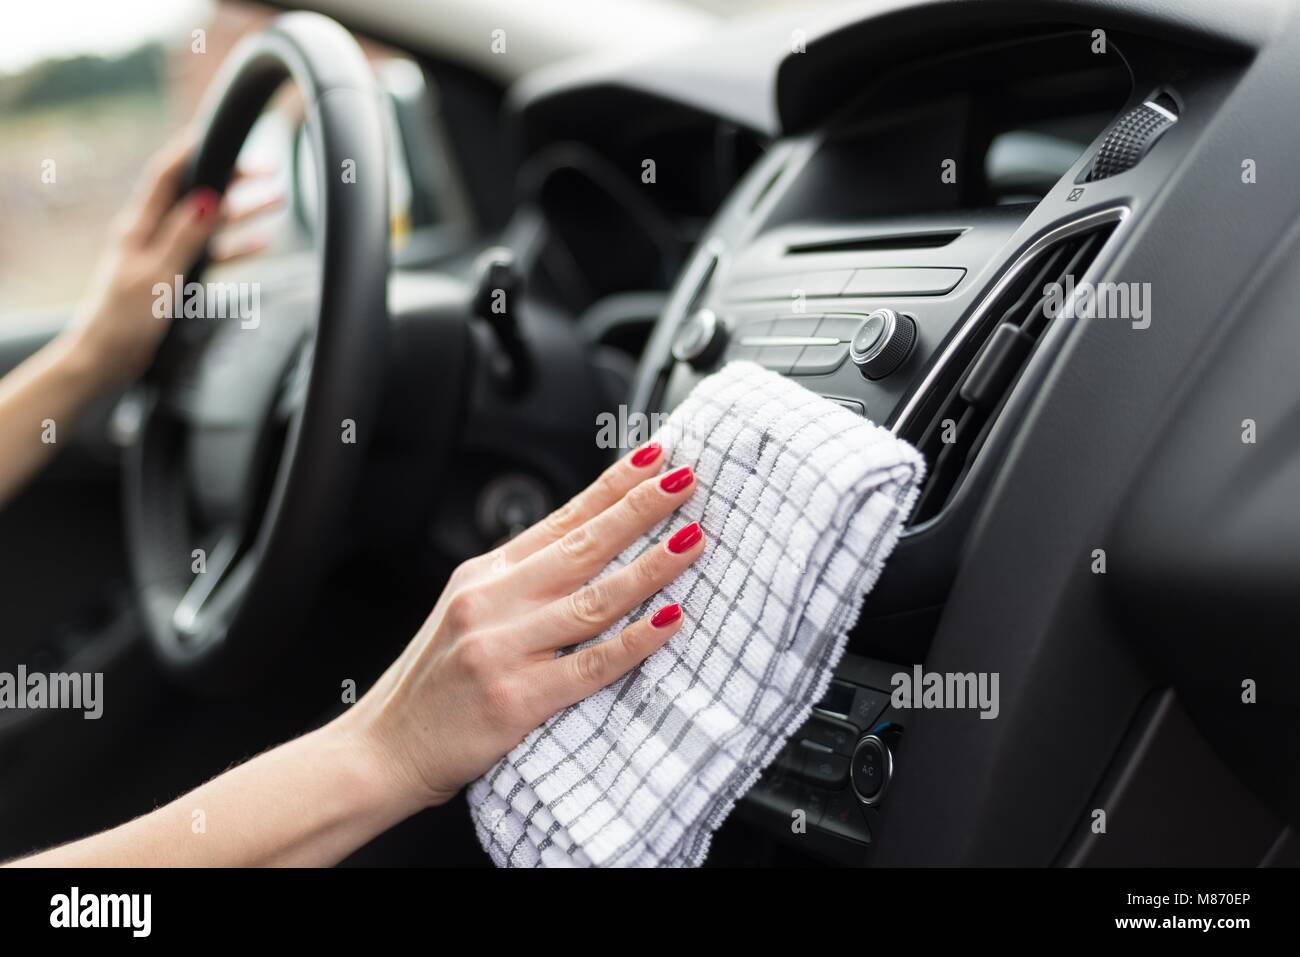 Woman Cleaning Car Dashboard. Modern Car Interior